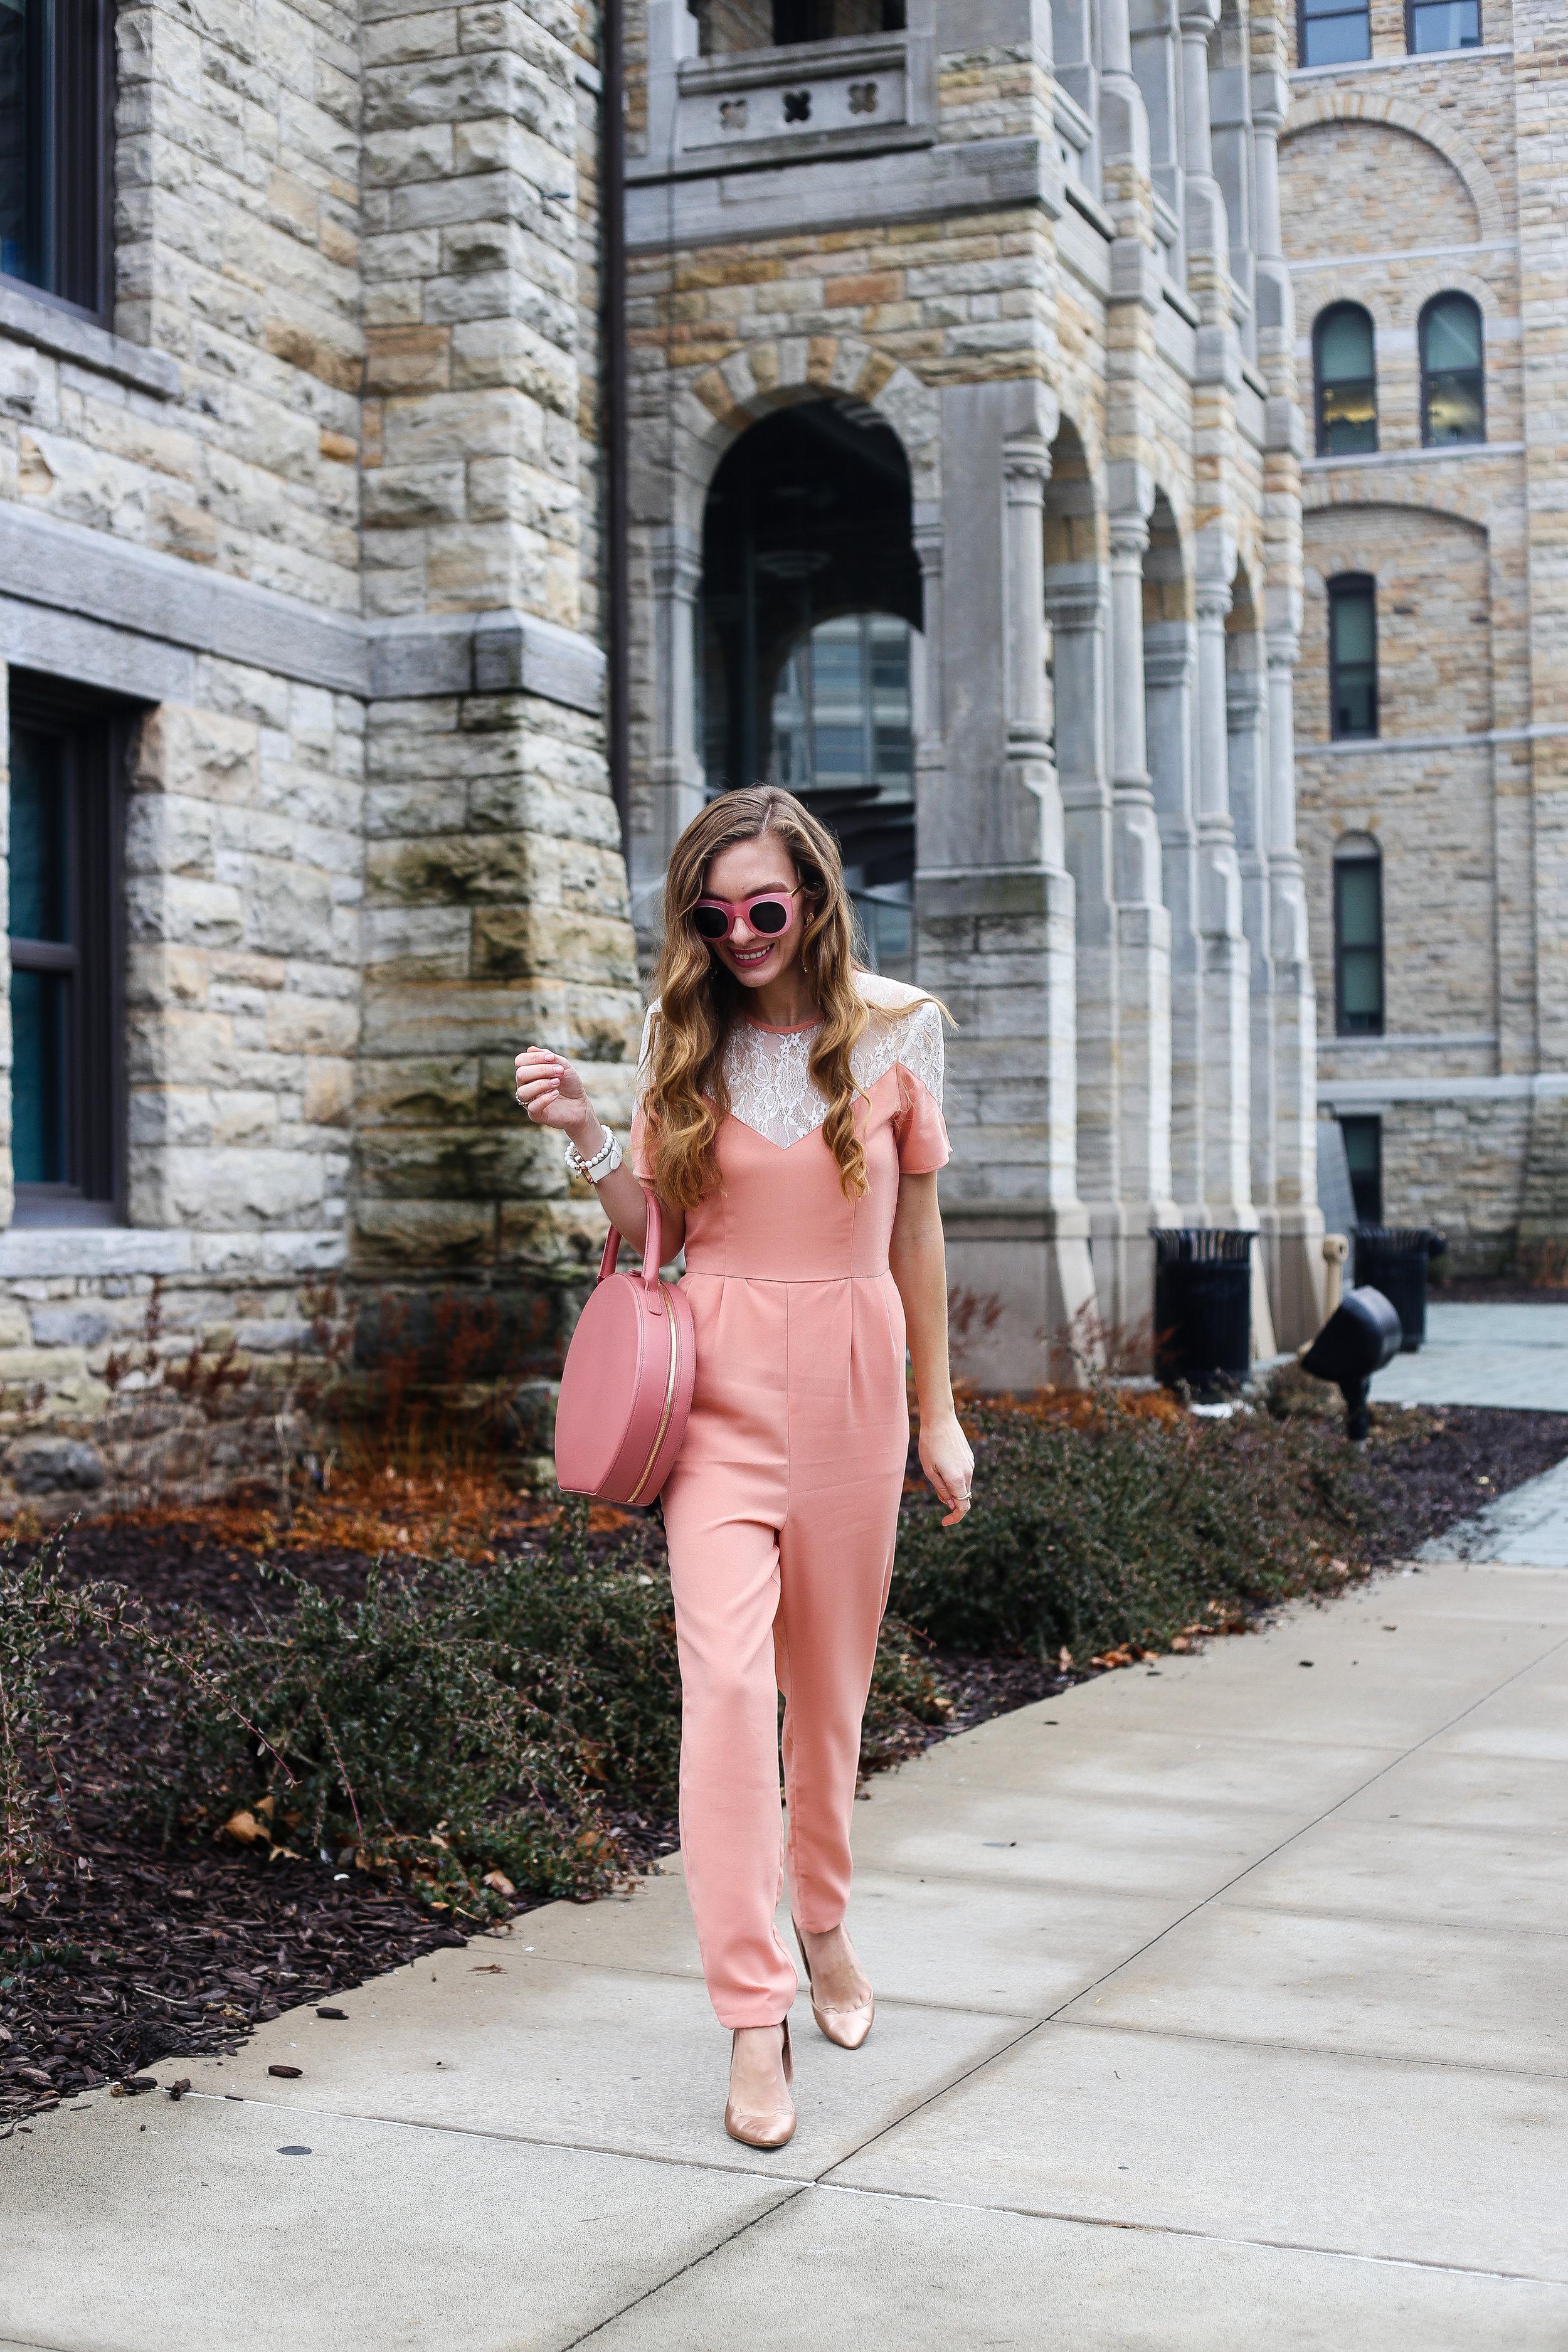 Peachy Keen- Enchanting Elegance